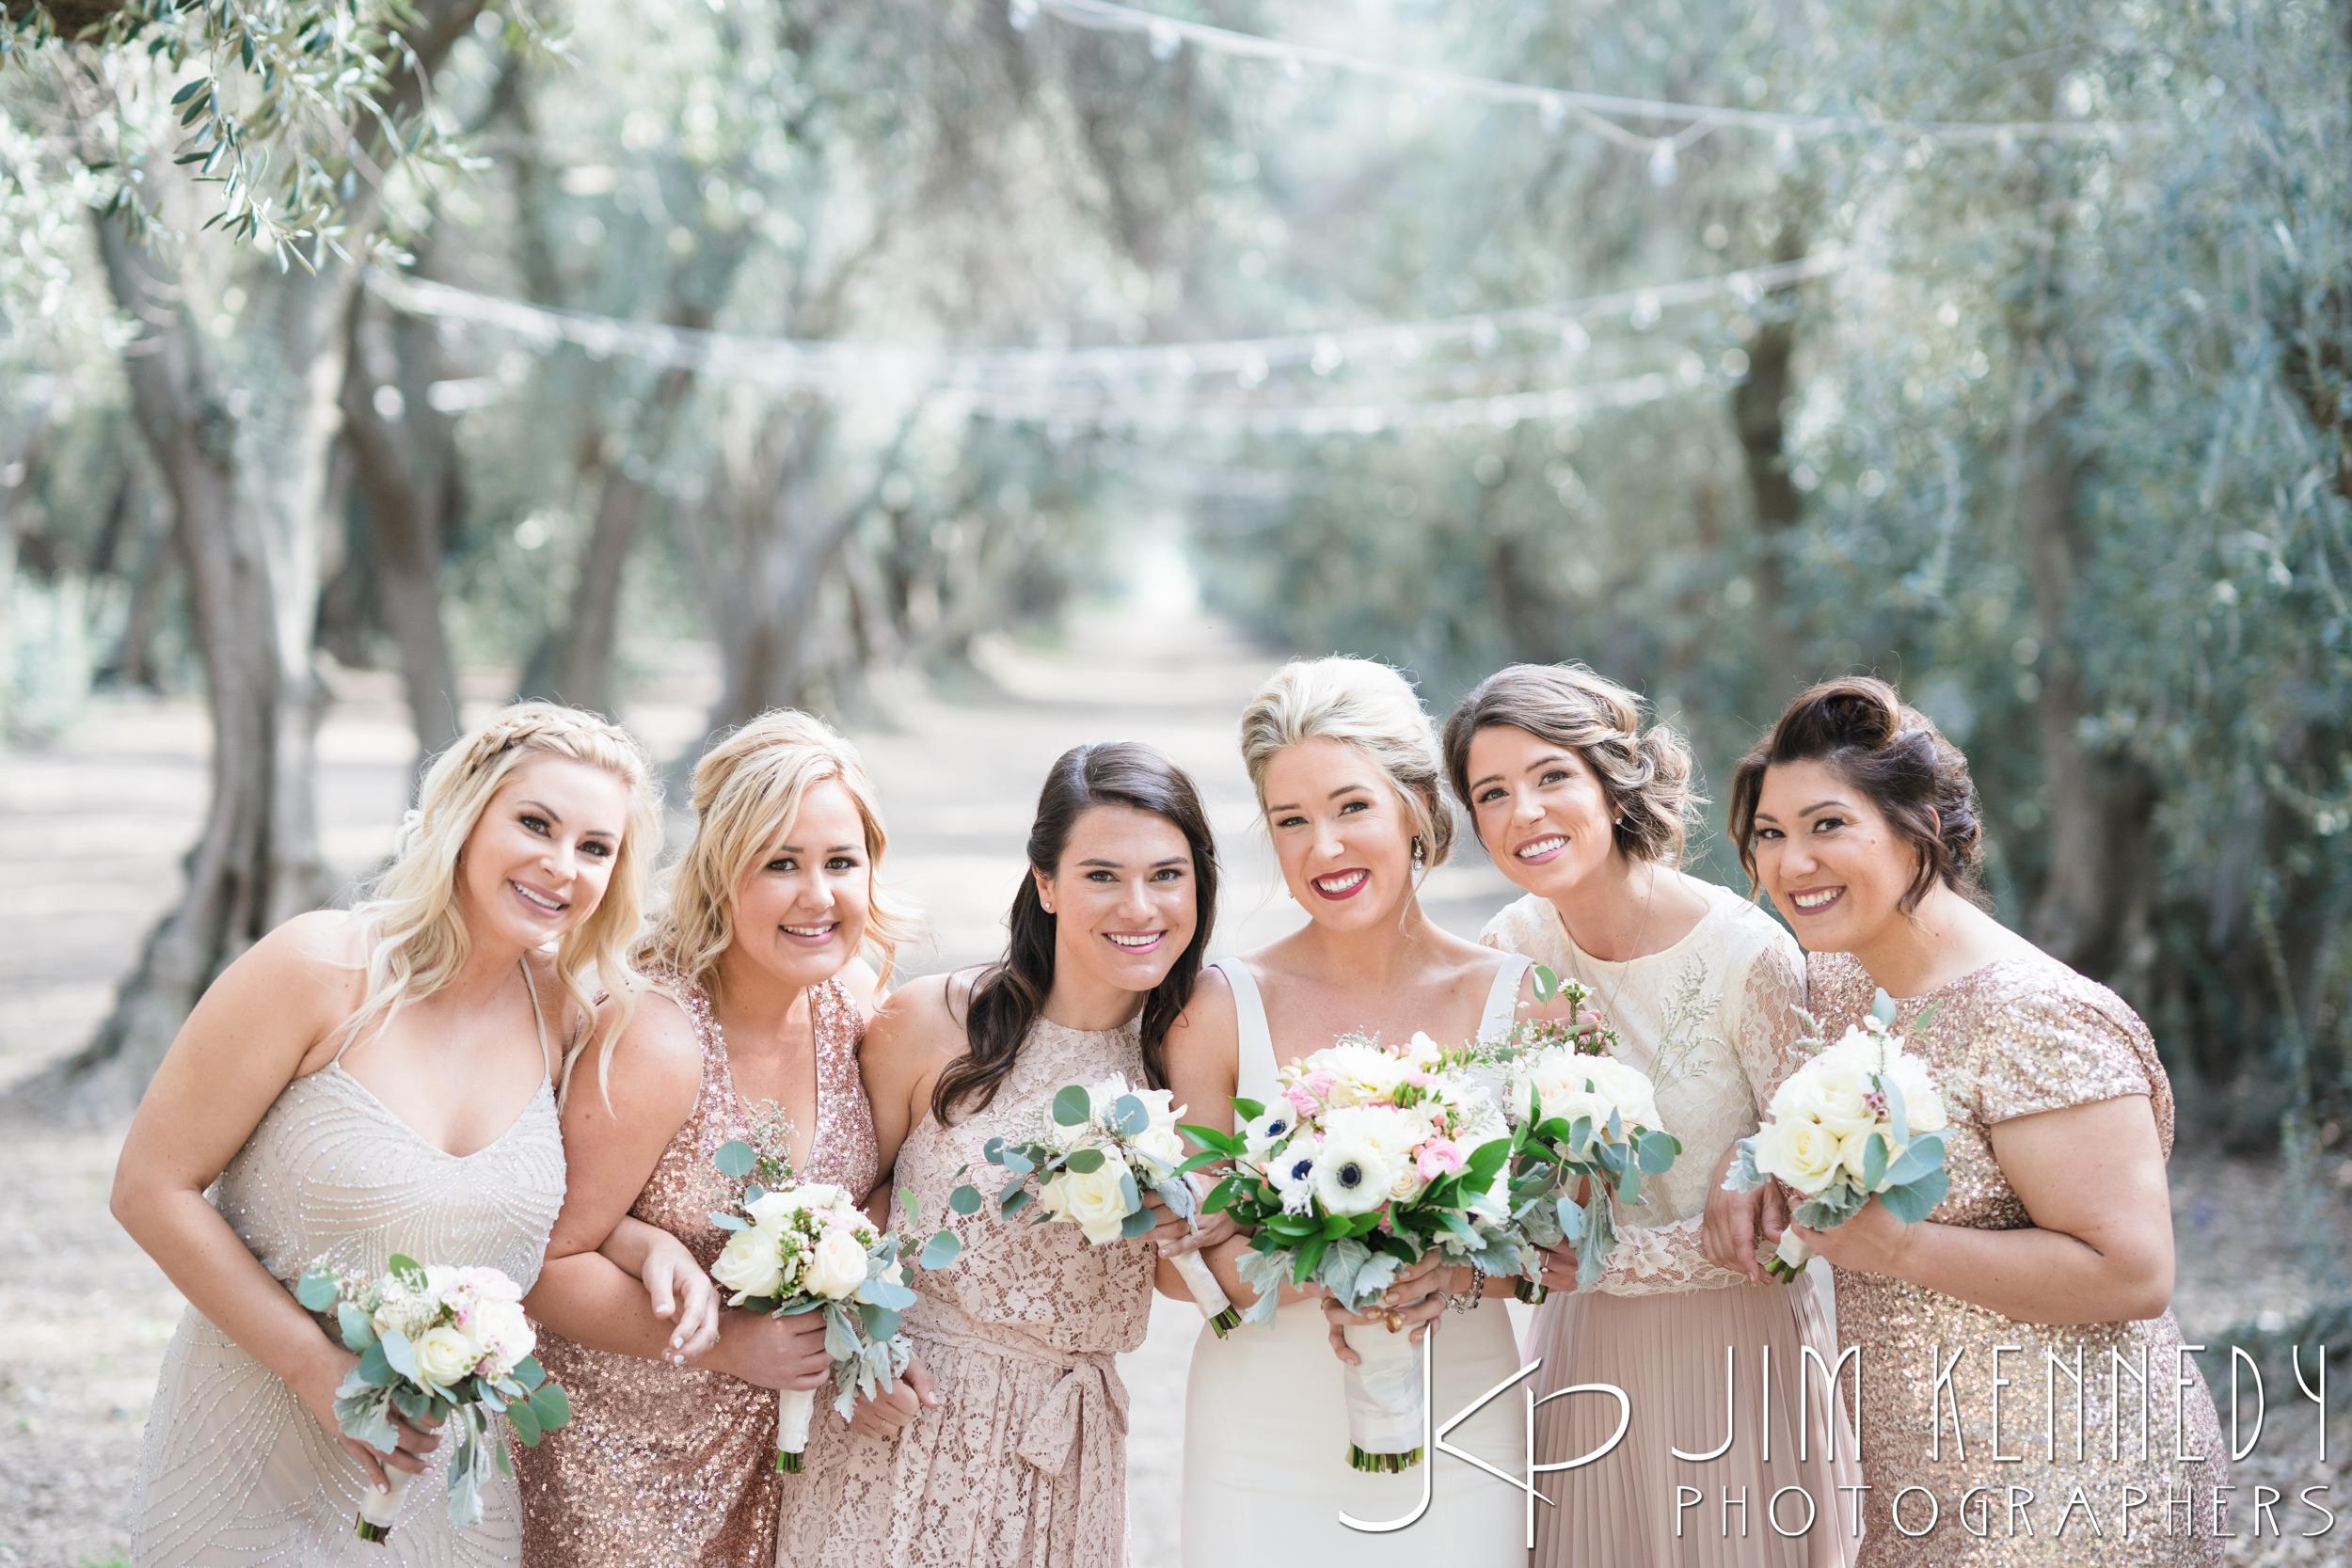 jim_kennedy_photographers_highland_springs_wedding_caitlyn_0063.jpg